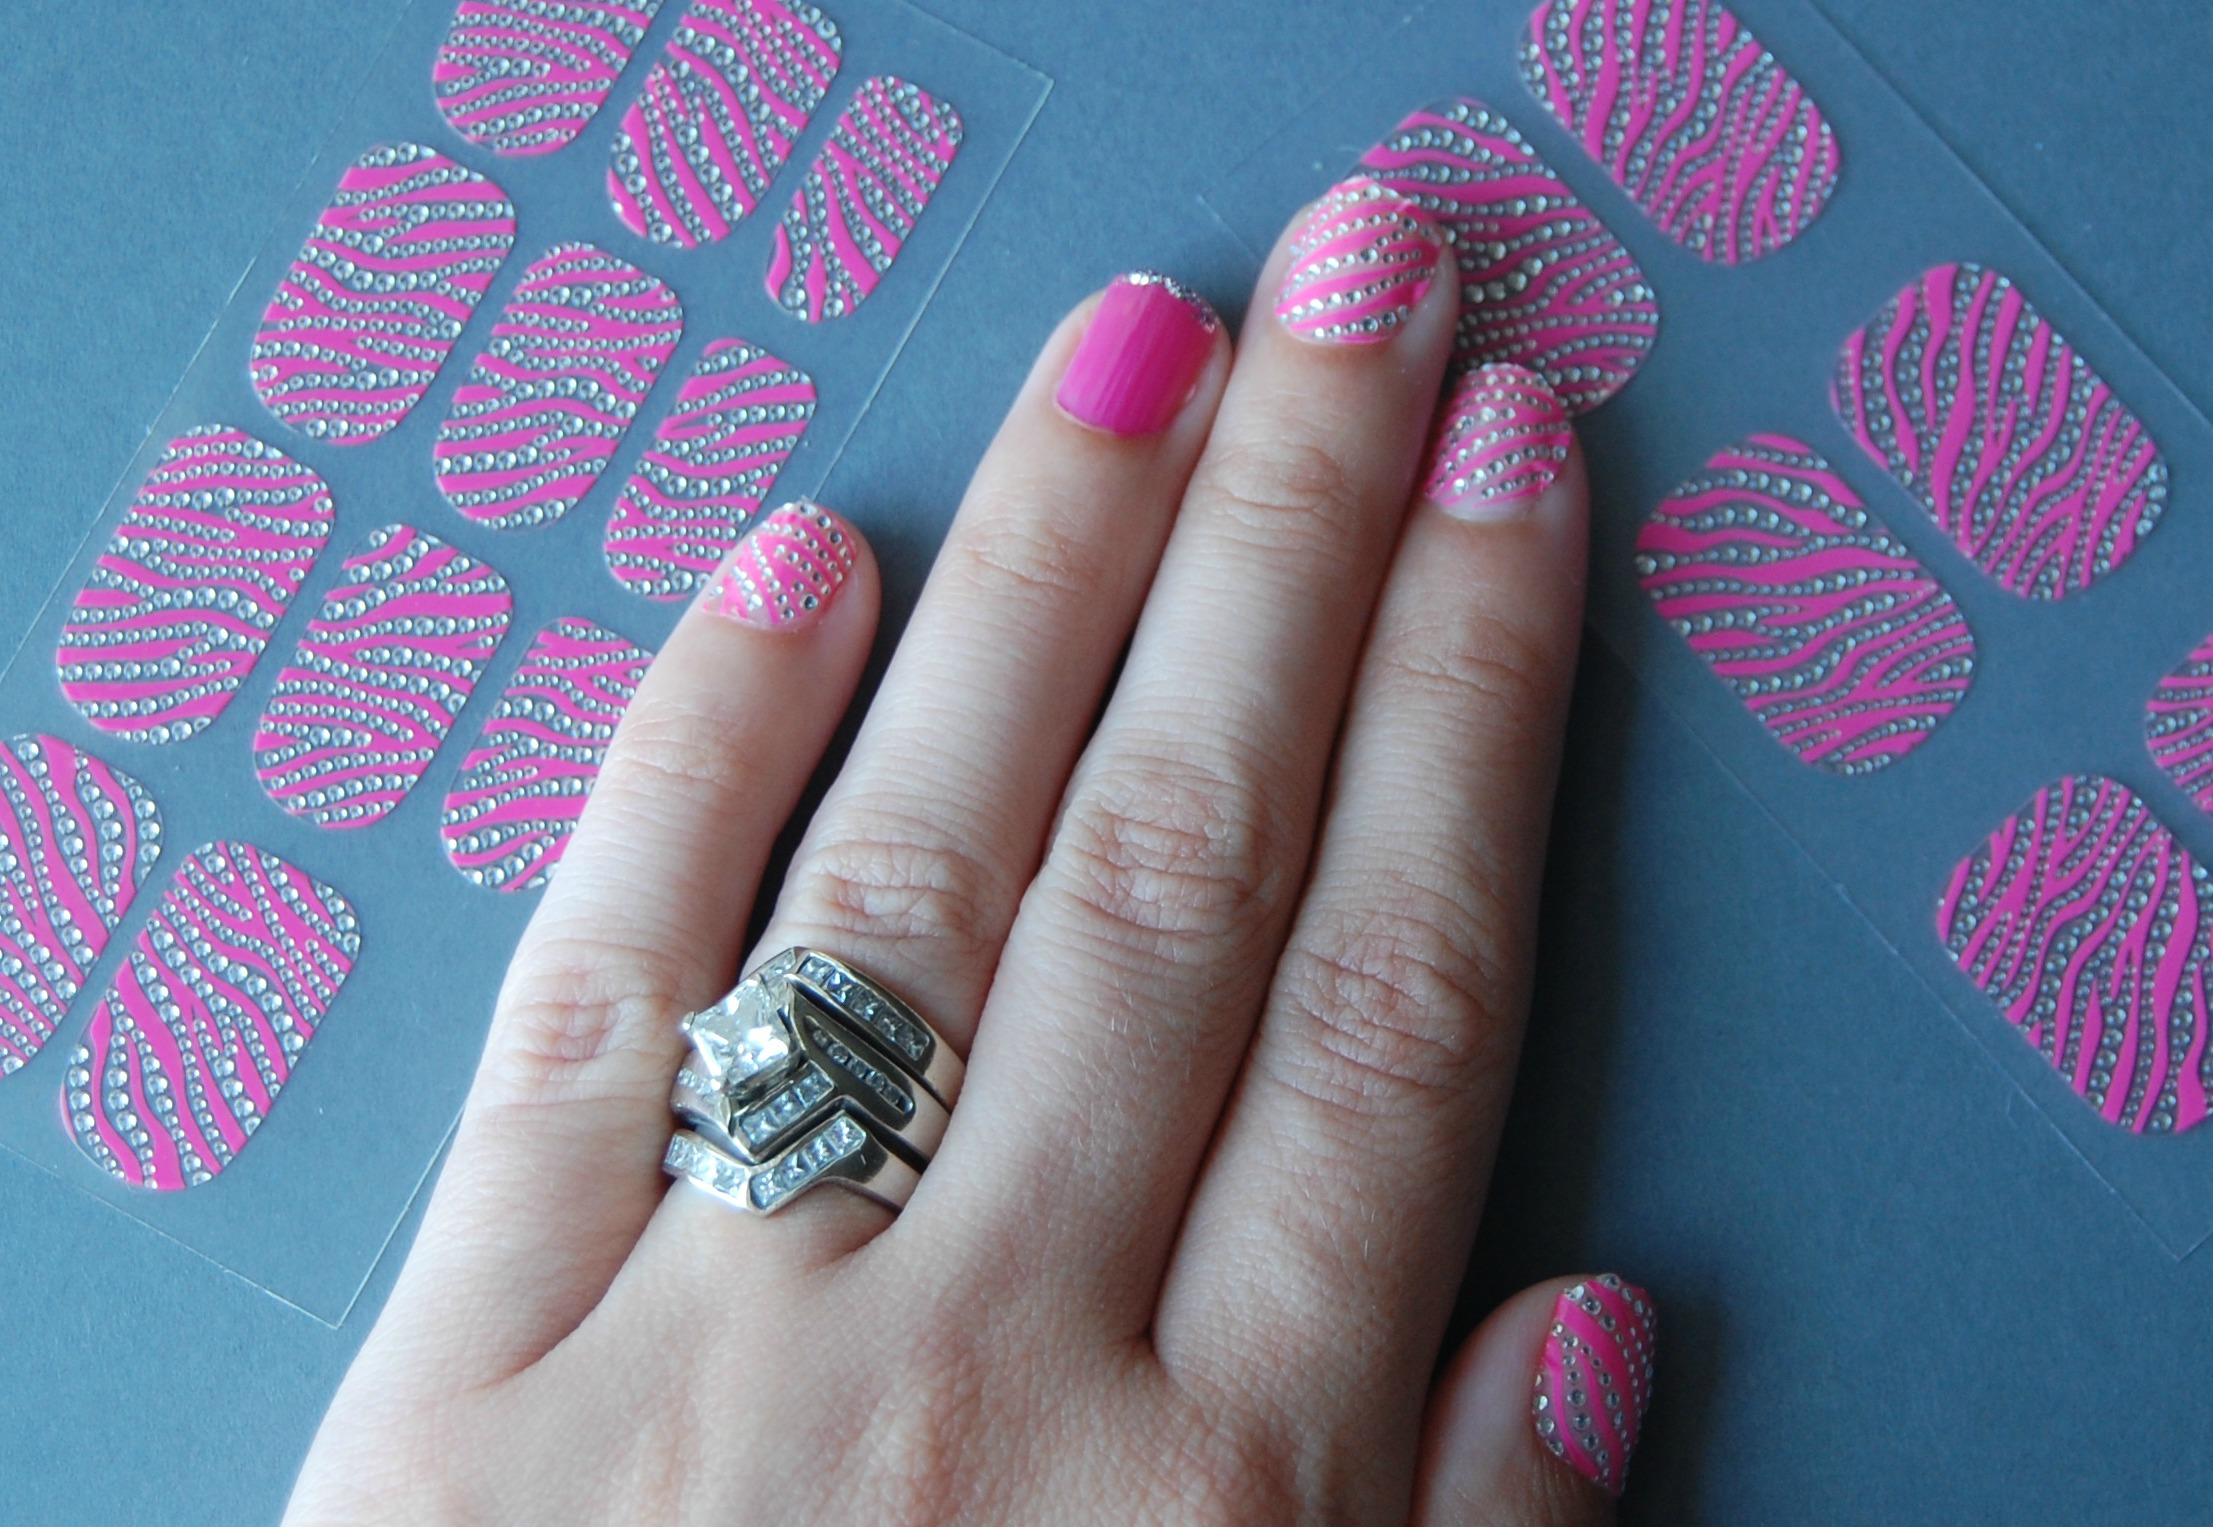 [Contest] Help me pick my birthday nails! : RandomActsOfPolish